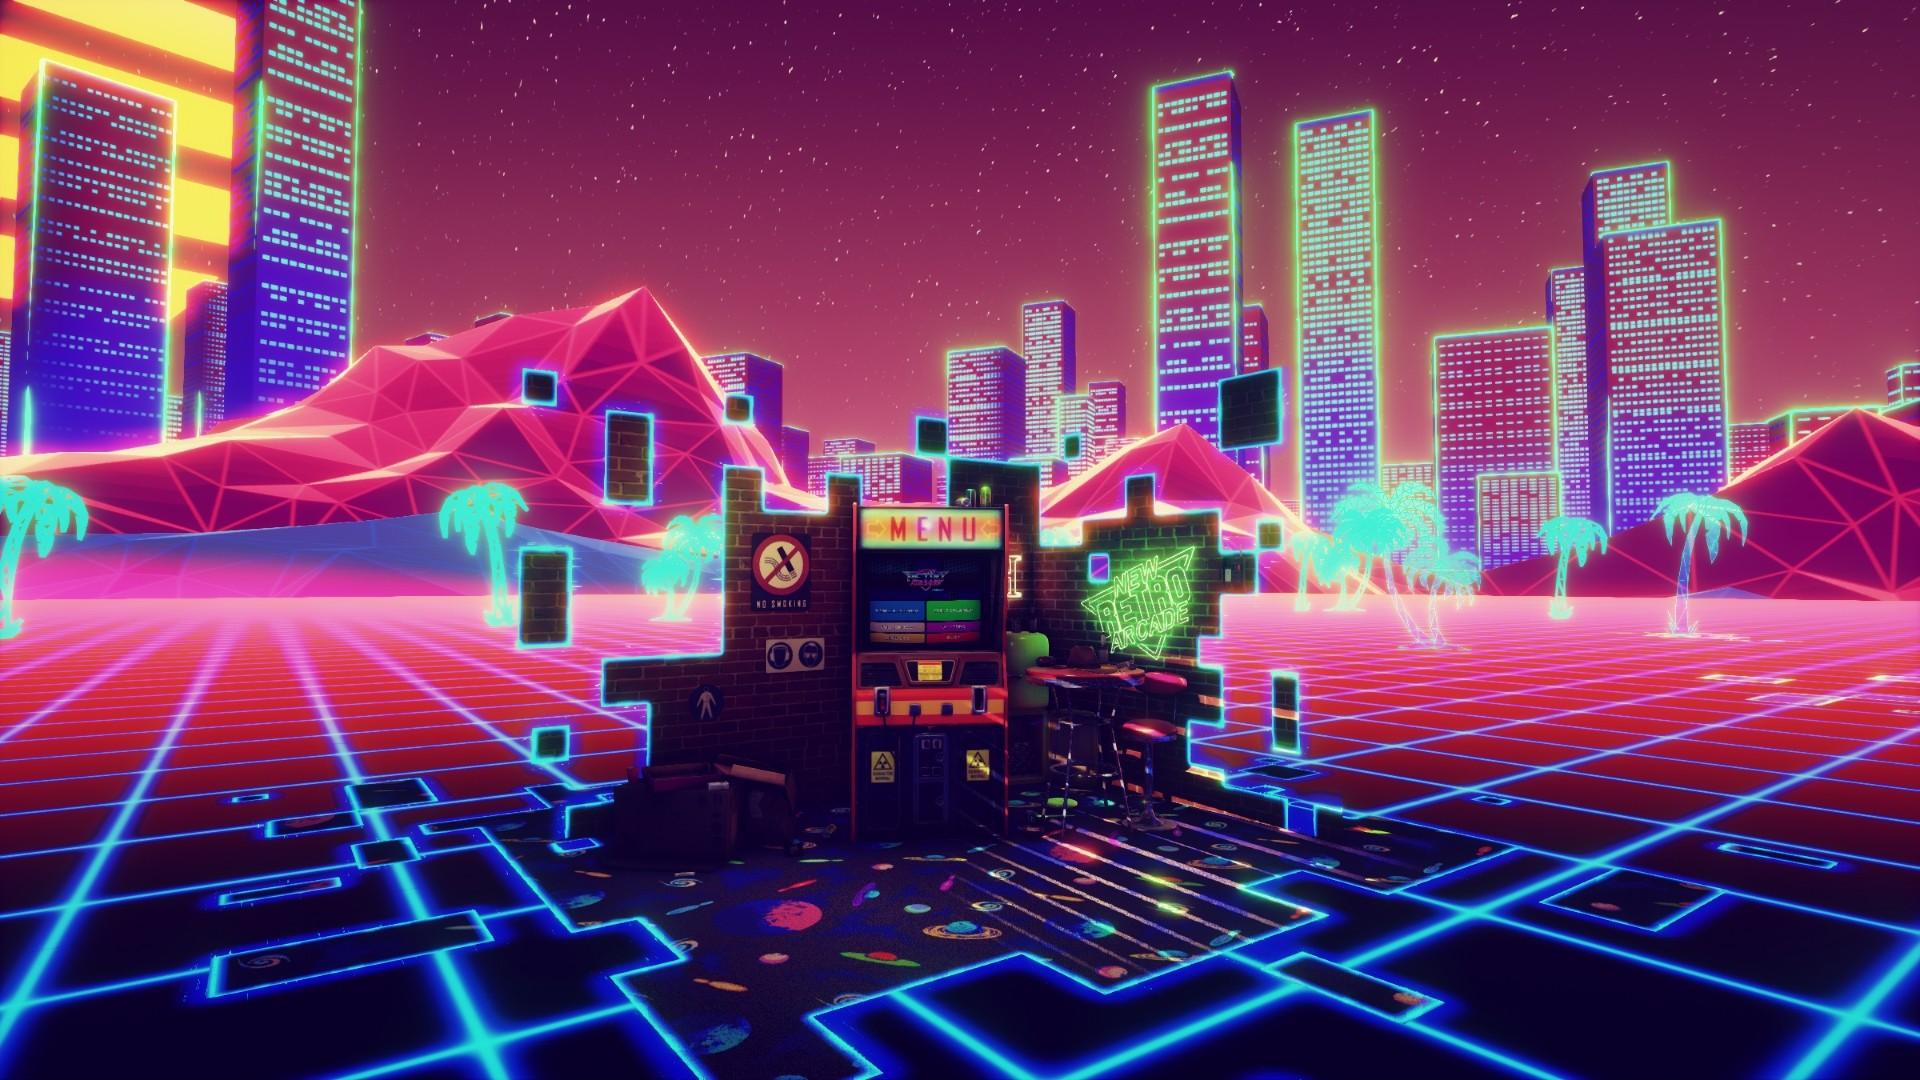 Res: 1920x1080, New Retro Arcade Neon 4